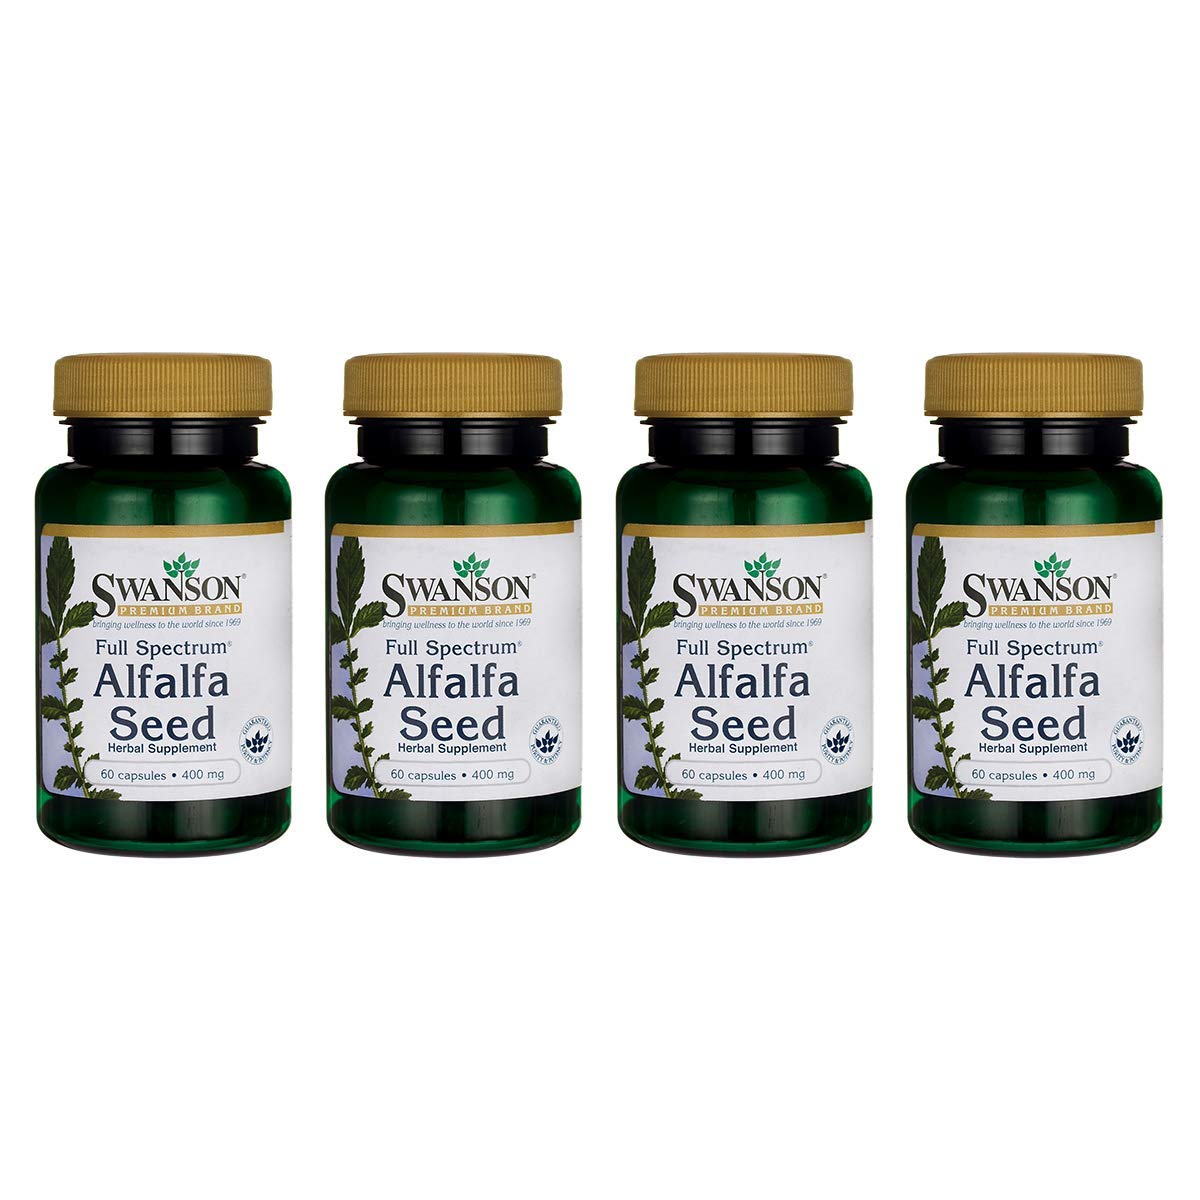 Swanson Full Spectrum Alfalfa Seed 400 Milligrams 60 Capsules (4 Pack)